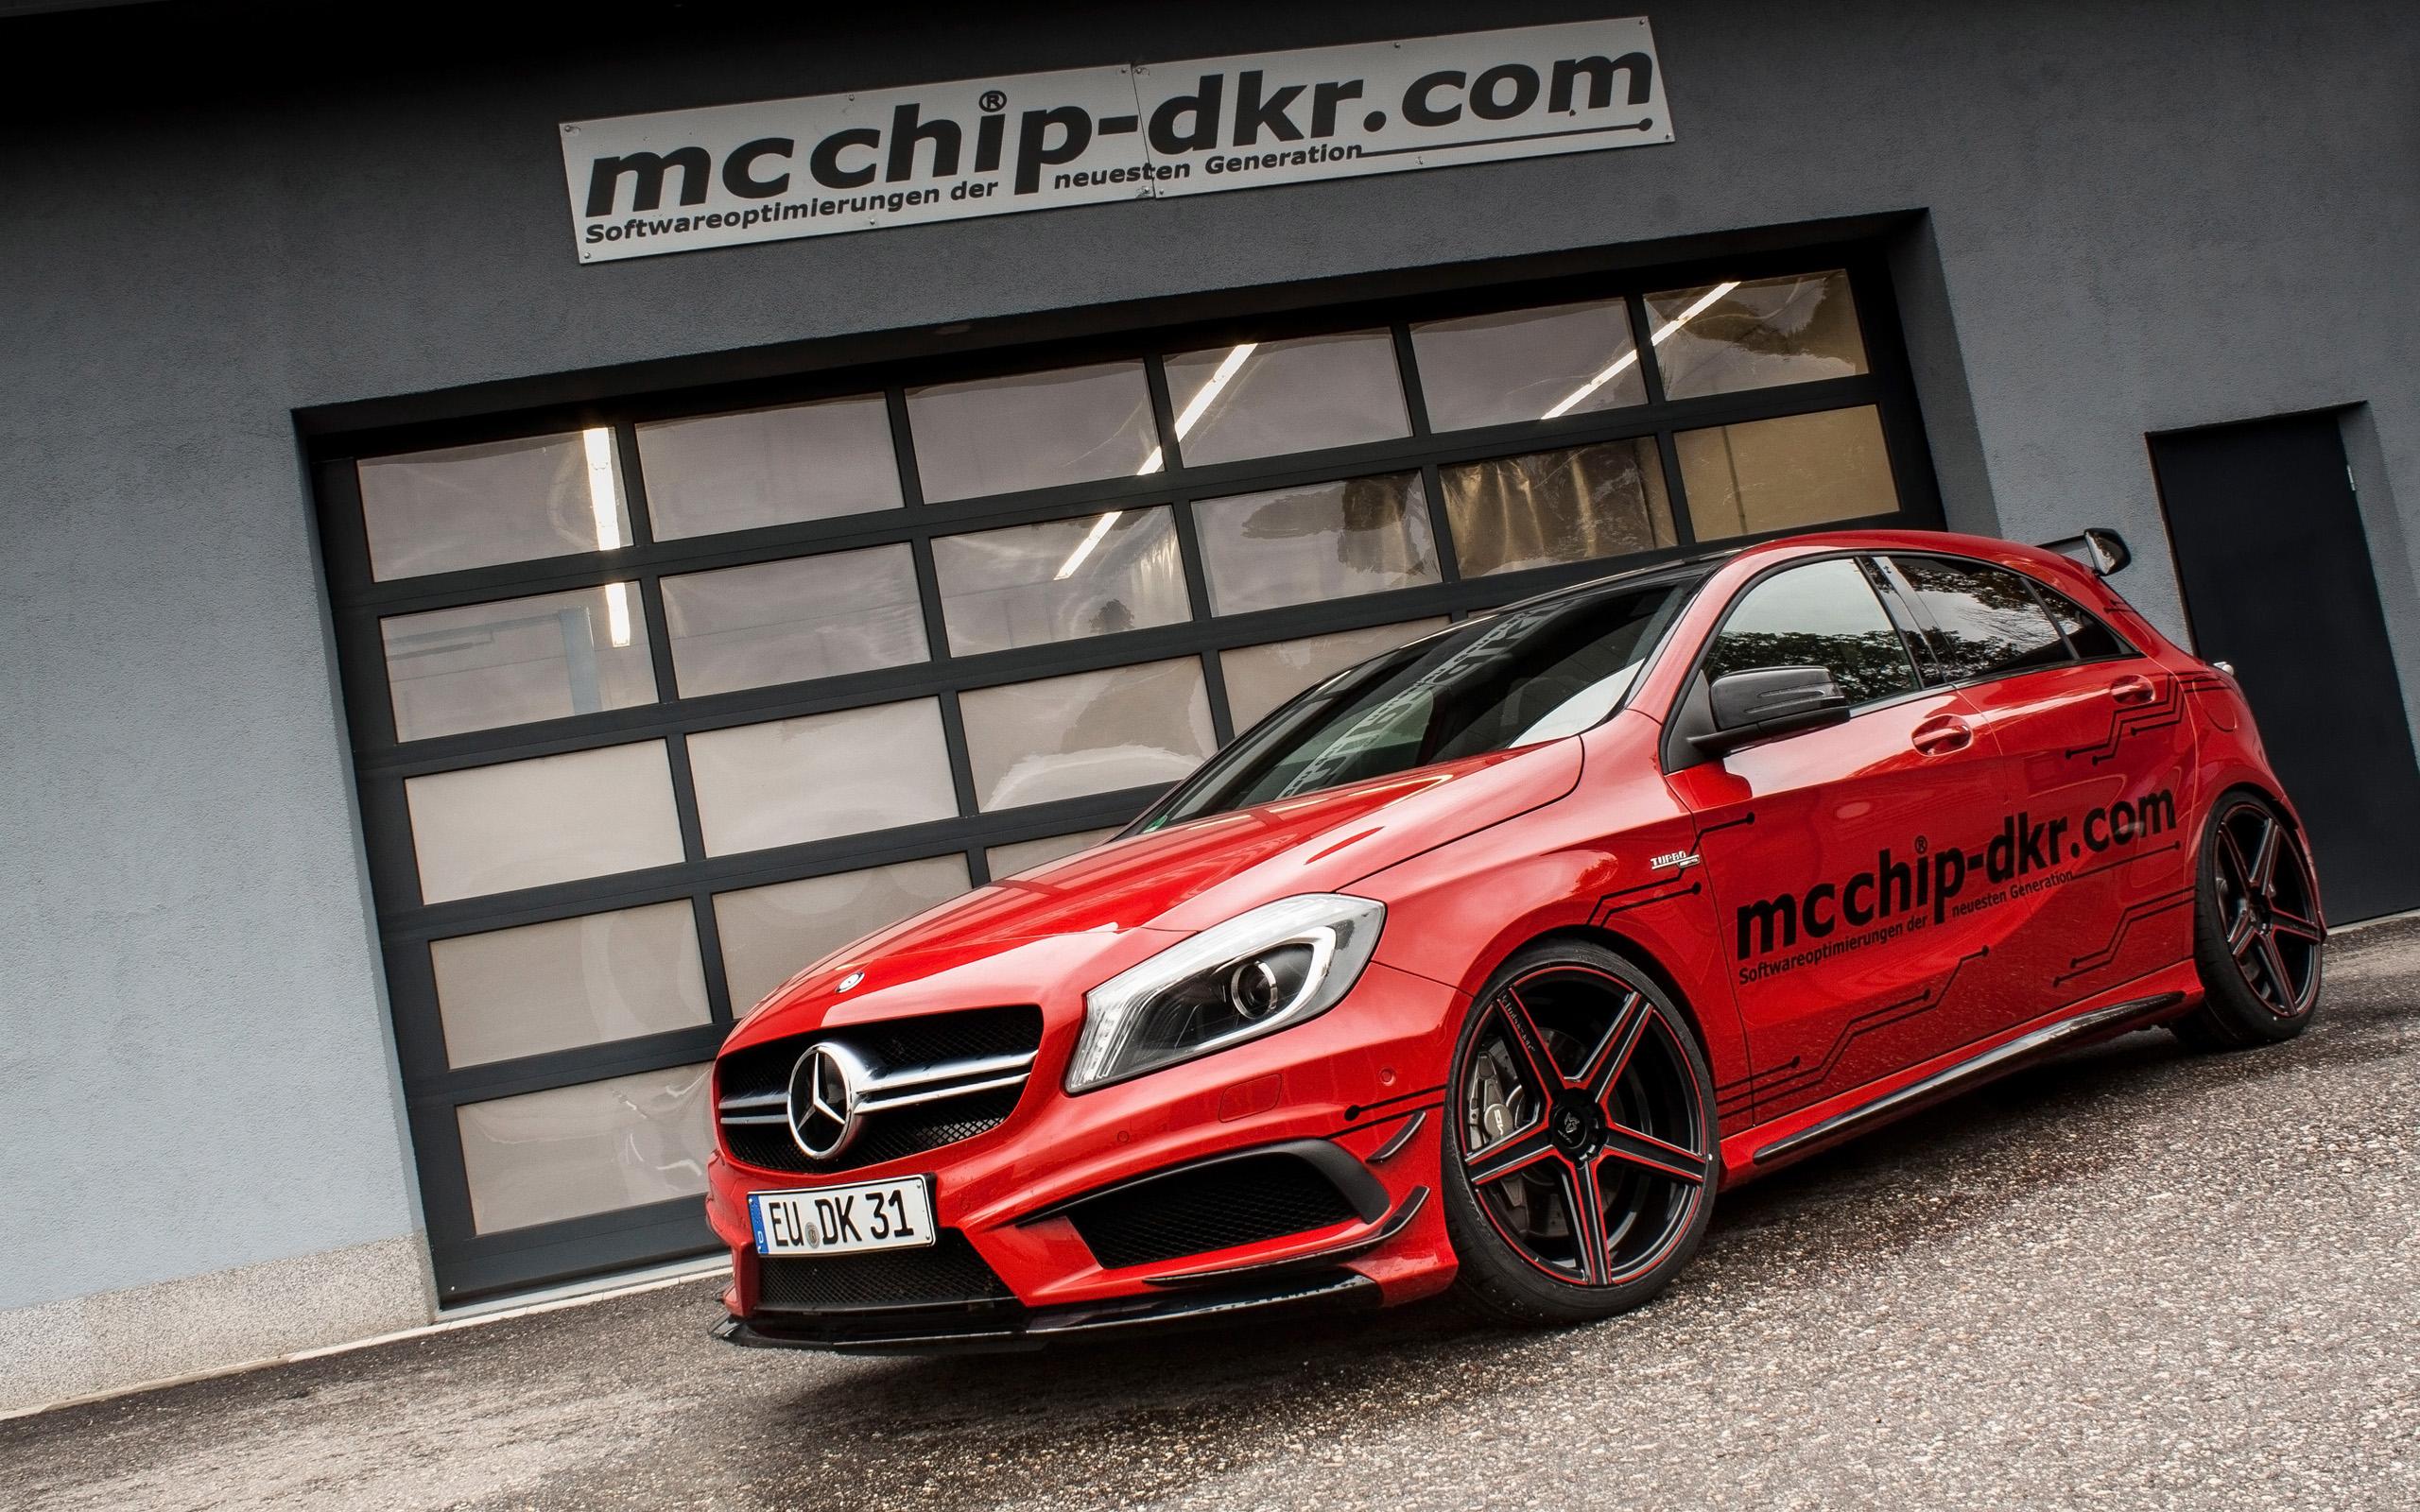 2014 mercedes benz a45 amg by mcchip dkr wallpaper hd for Mercedes benz amg a45